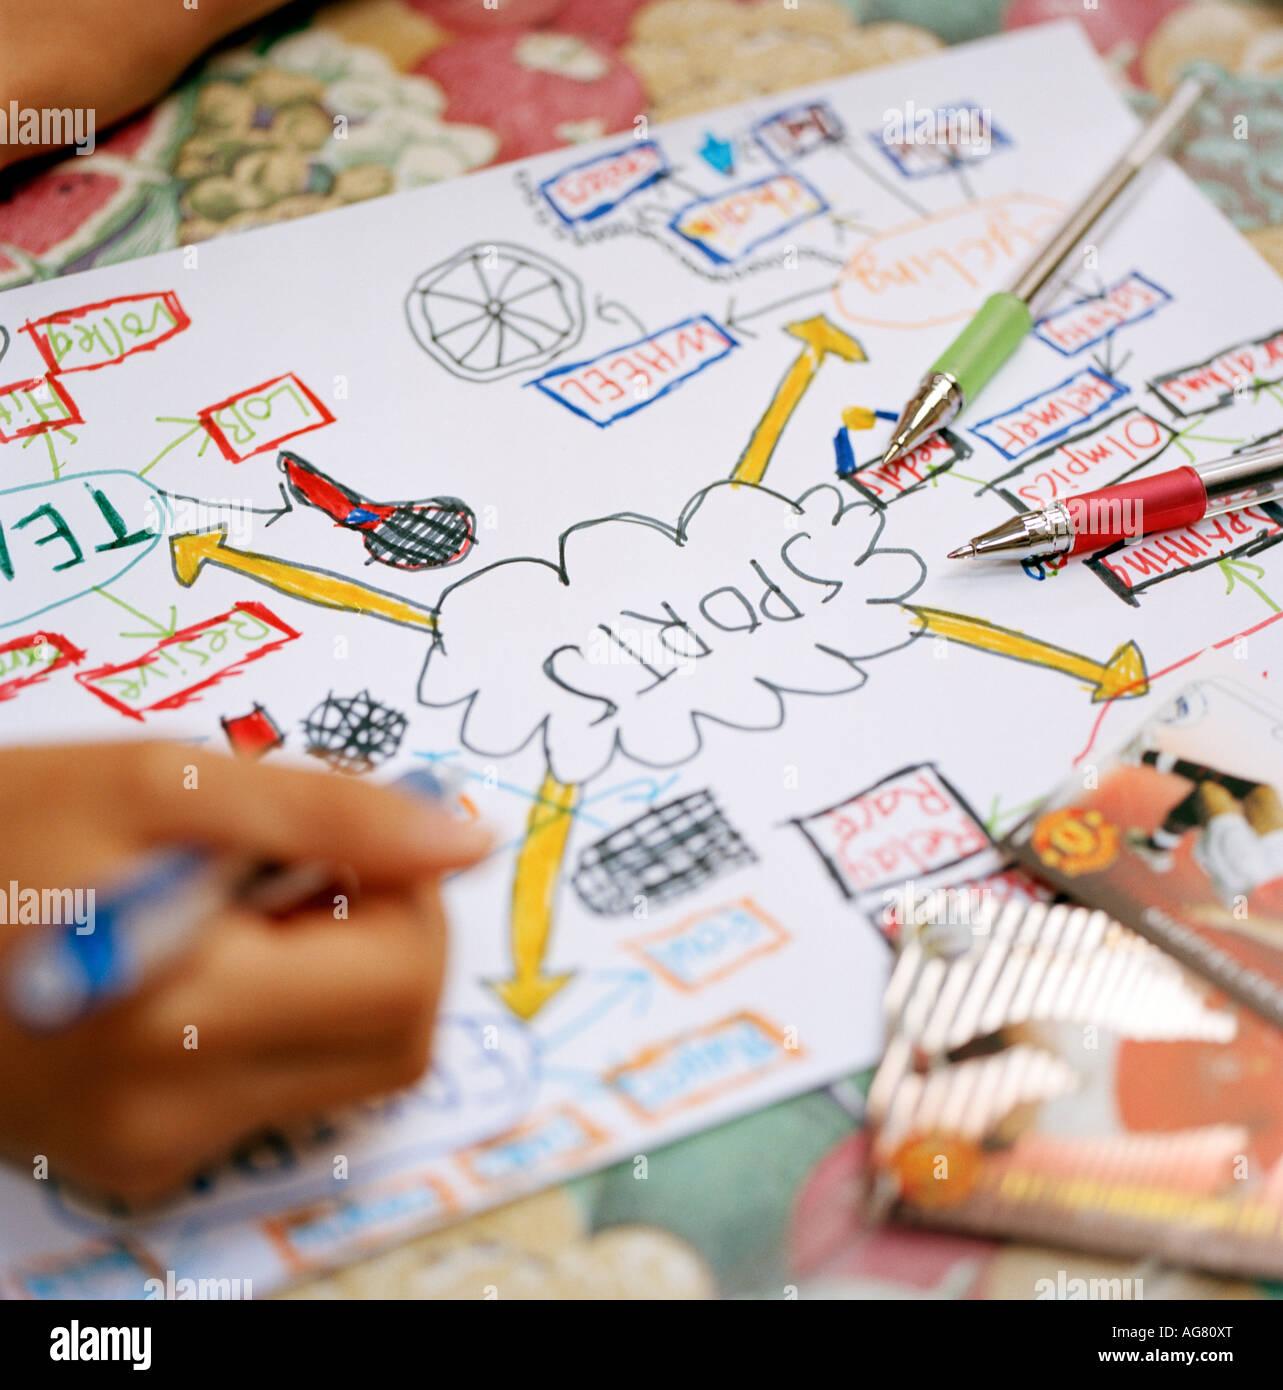 Boy Drawing A Mind Map About Sports Stock Photo Alamy